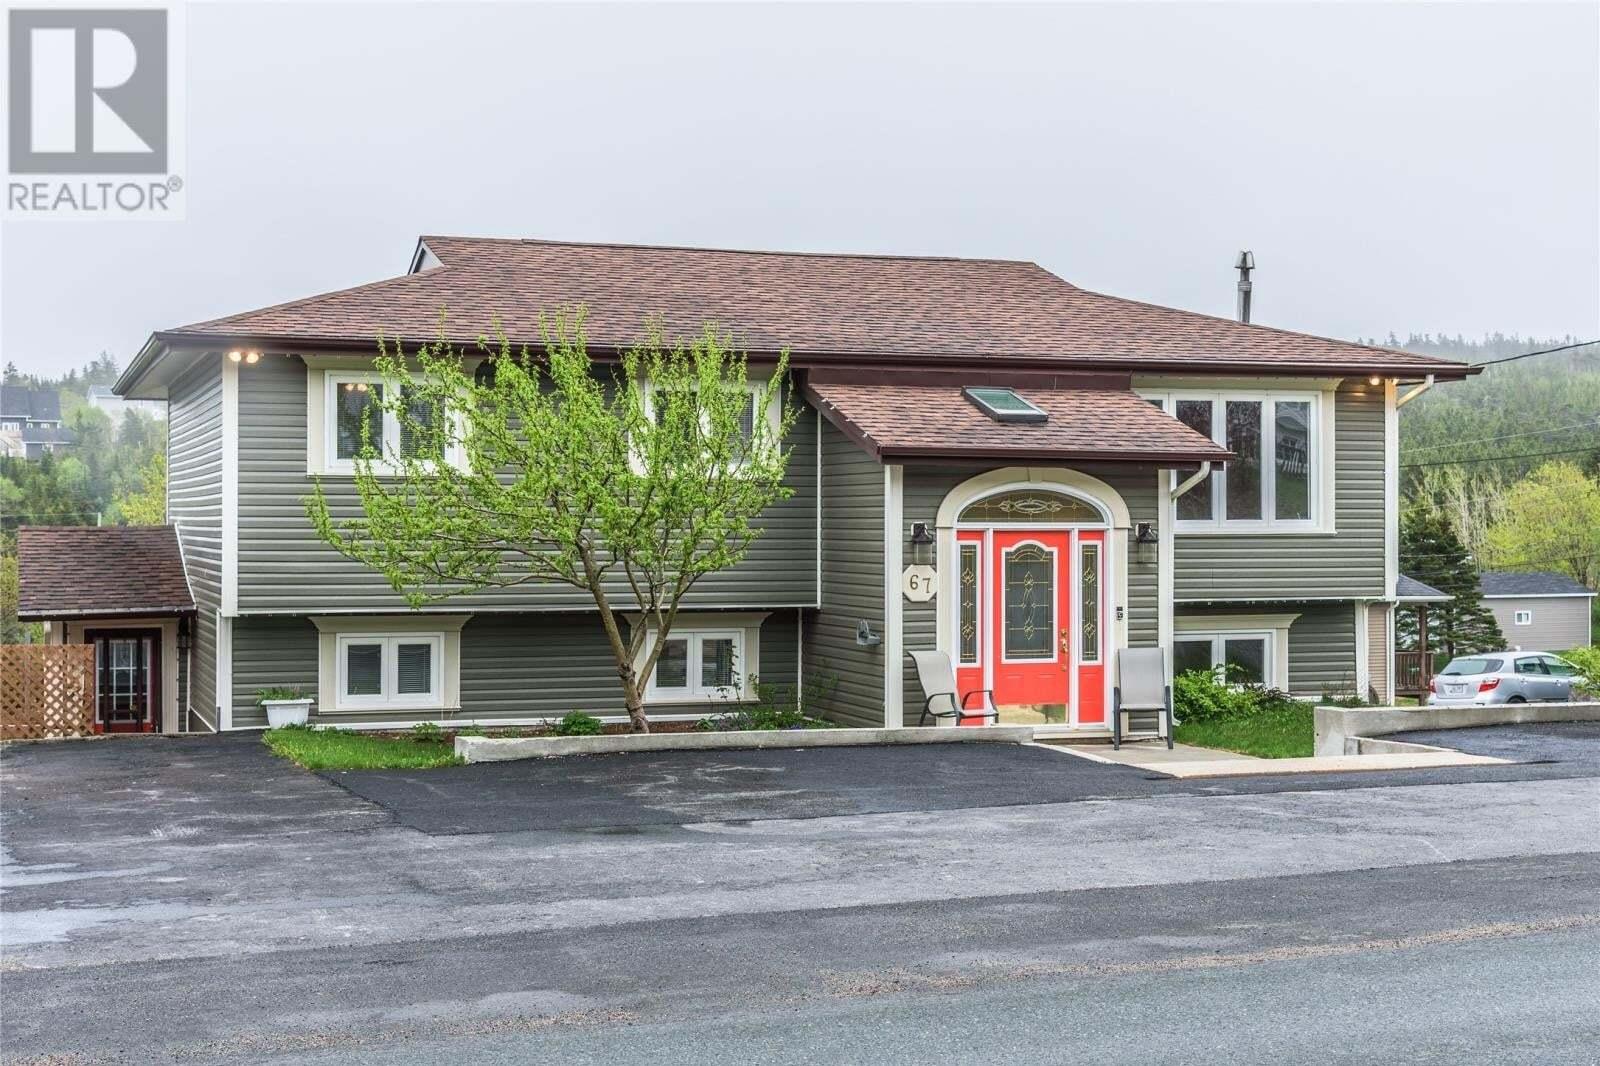 House for sale at 67 Indian Meal Line Torbay Newfoundland - MLS: 1214650